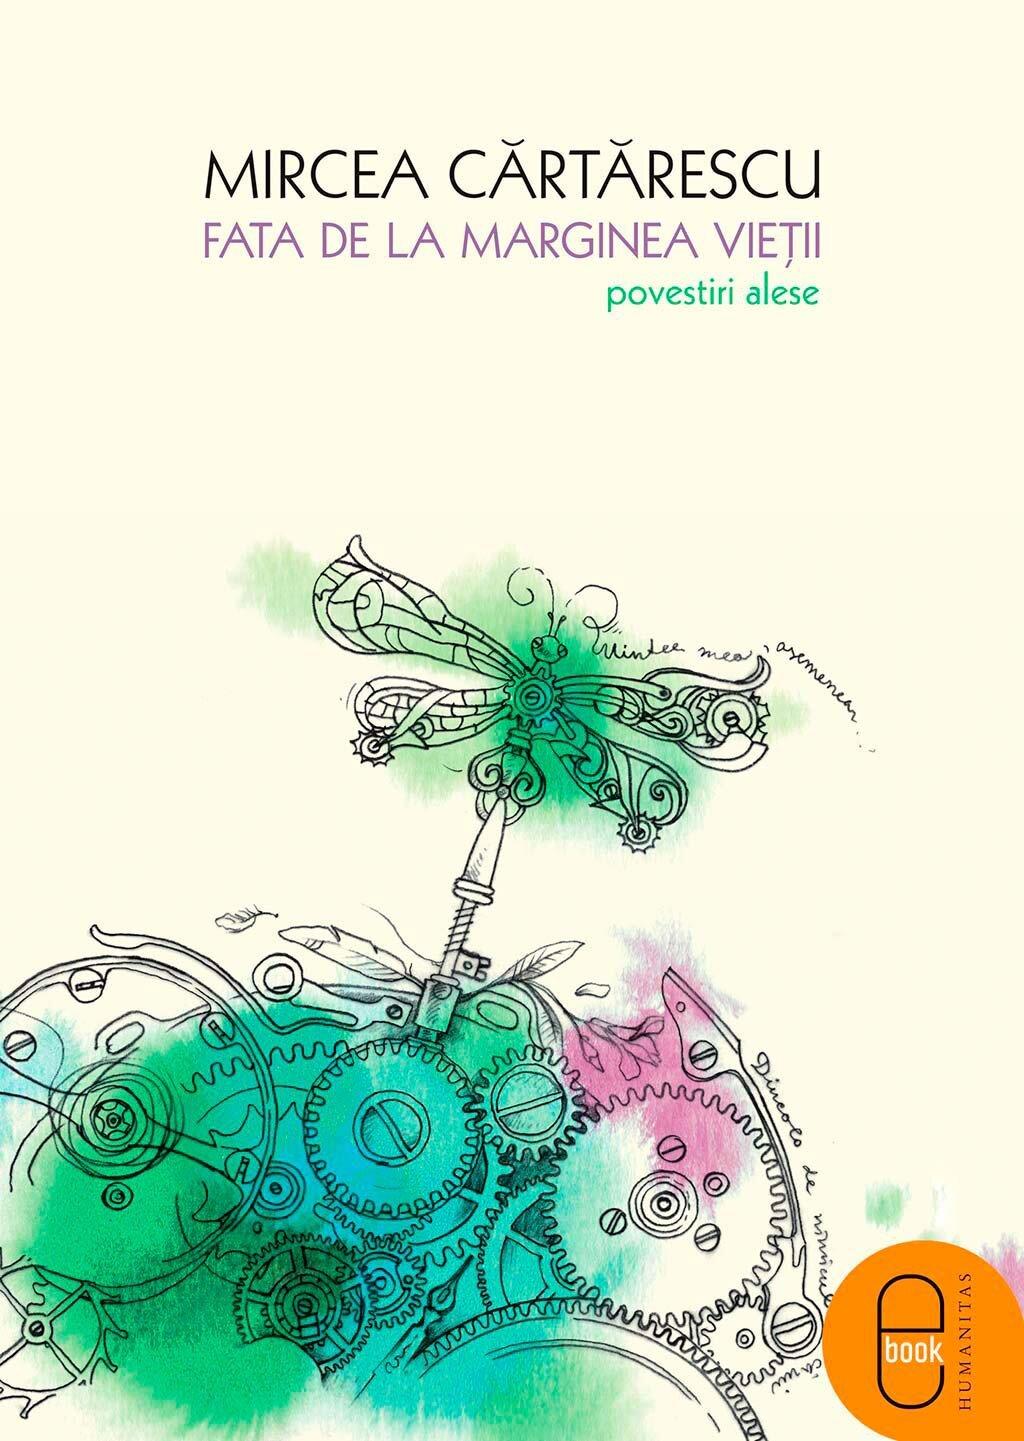 Fata de la marginea vietii. Povestiri alese (eBook)